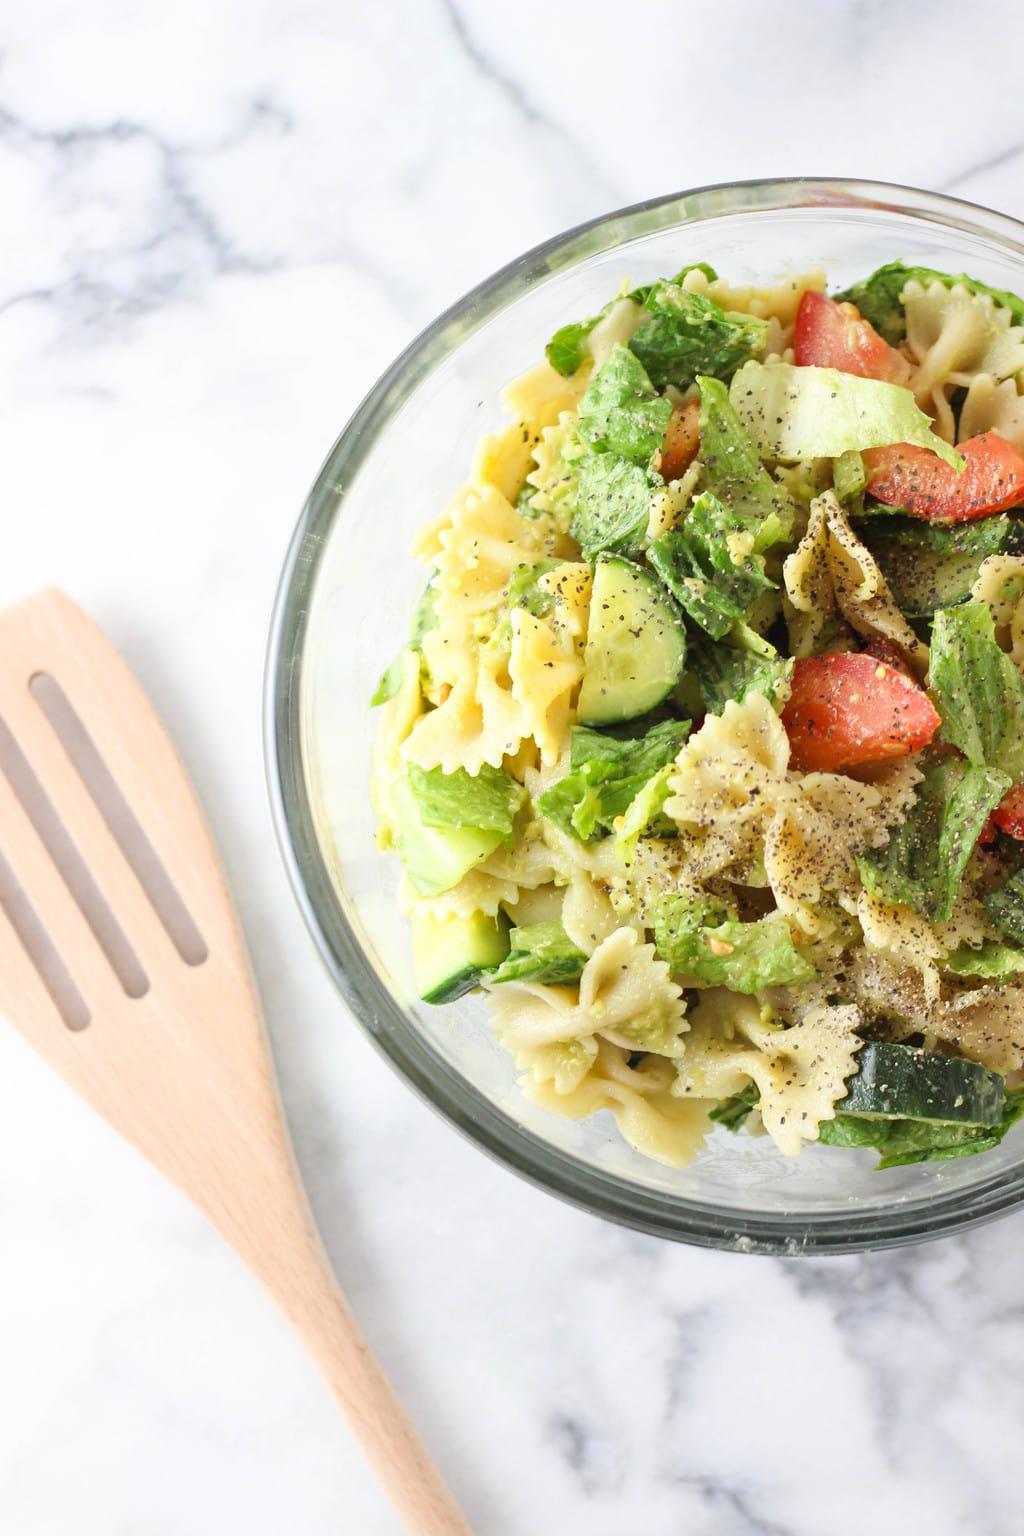 Avocado Pasta Salad Exploring Healthy Foods Watermelon Wallpaper Rainbow Find Free HD for Desktop [freshlhys.tk]